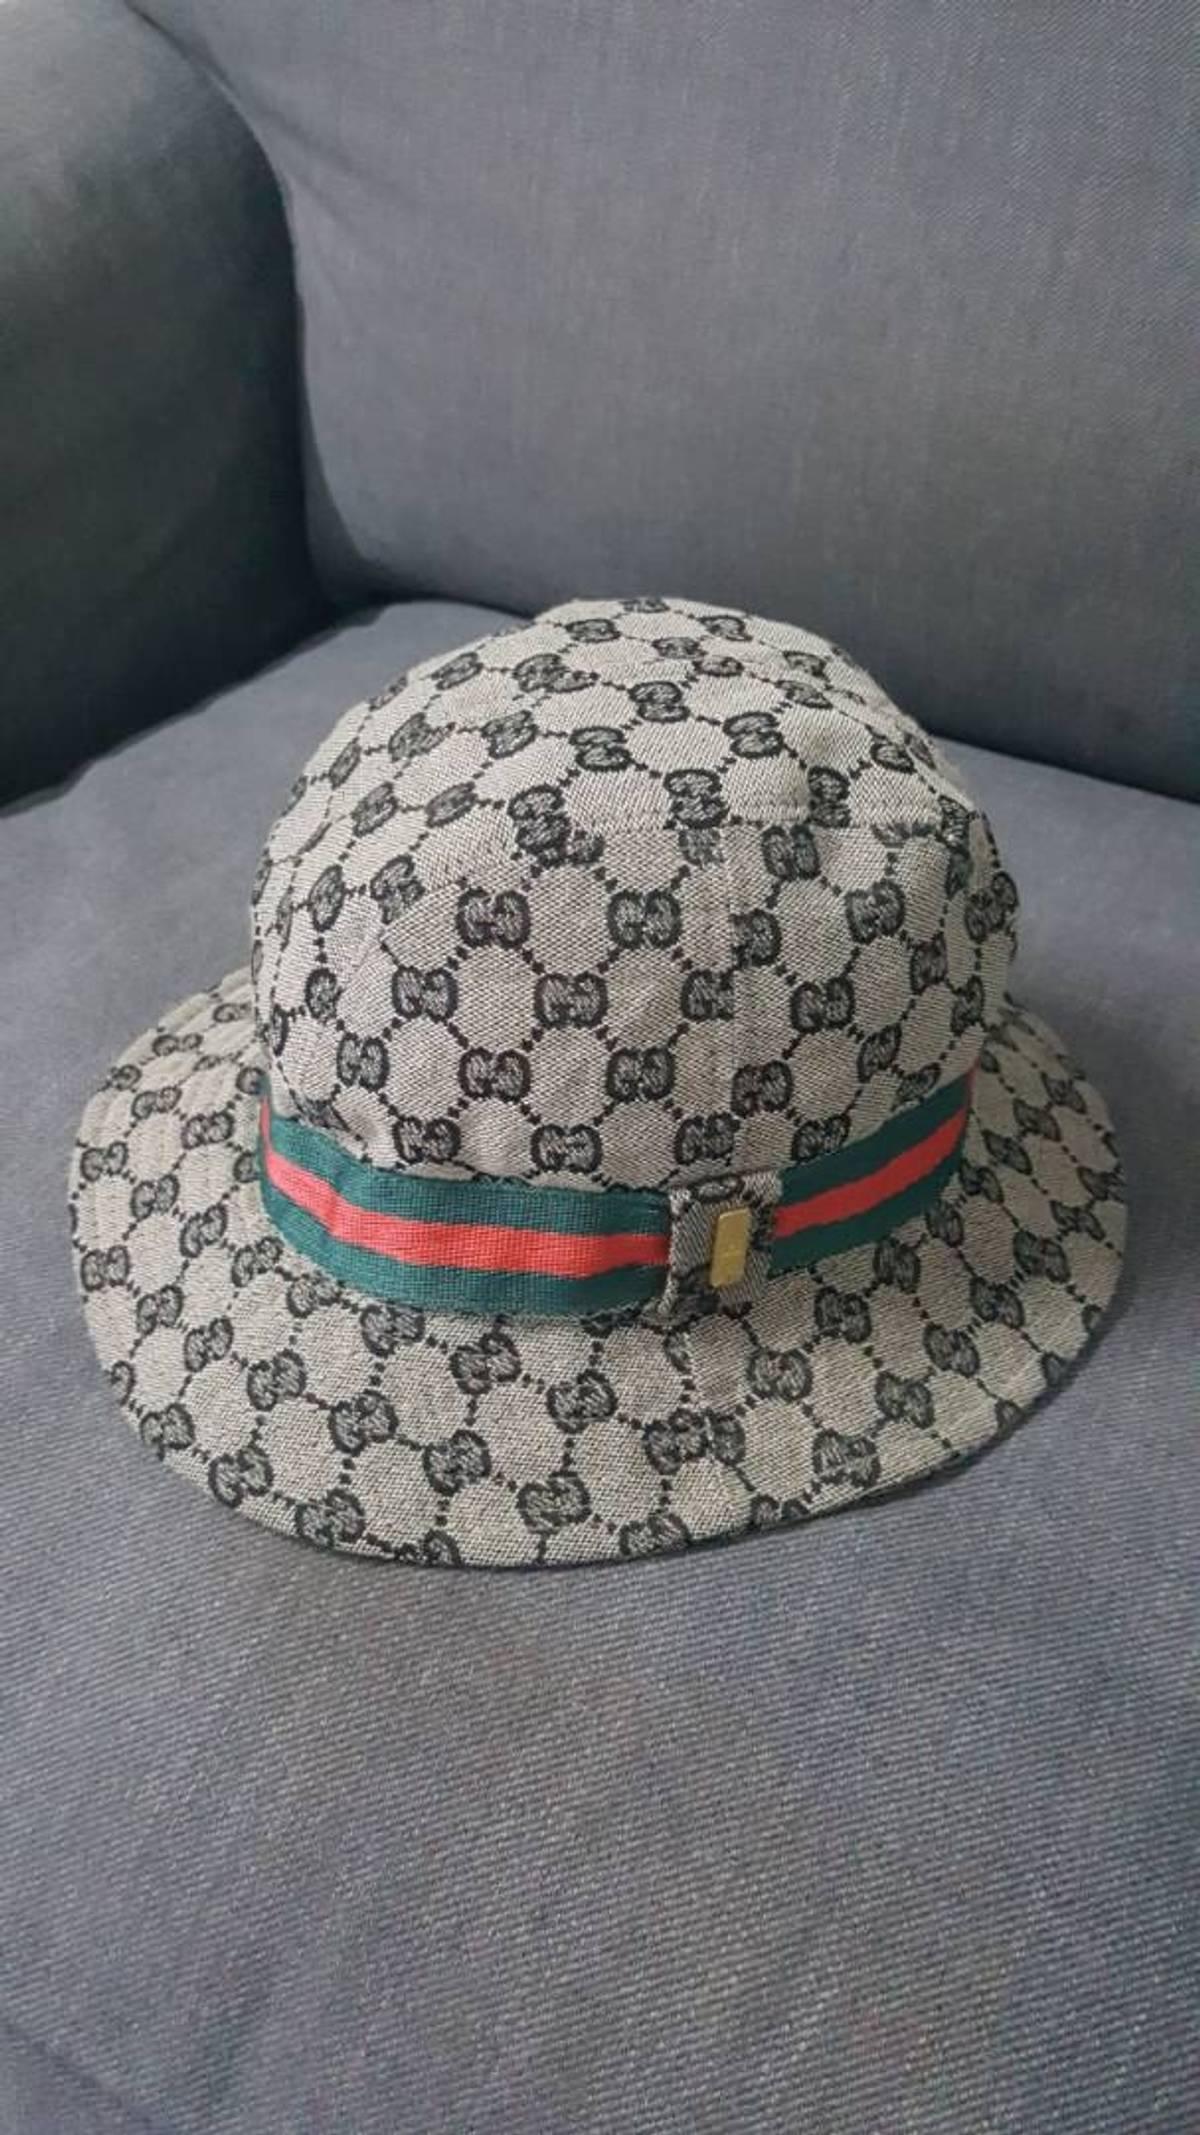 642dbba4 Gucci Authentic Gucci Bucket Hat Gc Monogram Fedora   Grailed